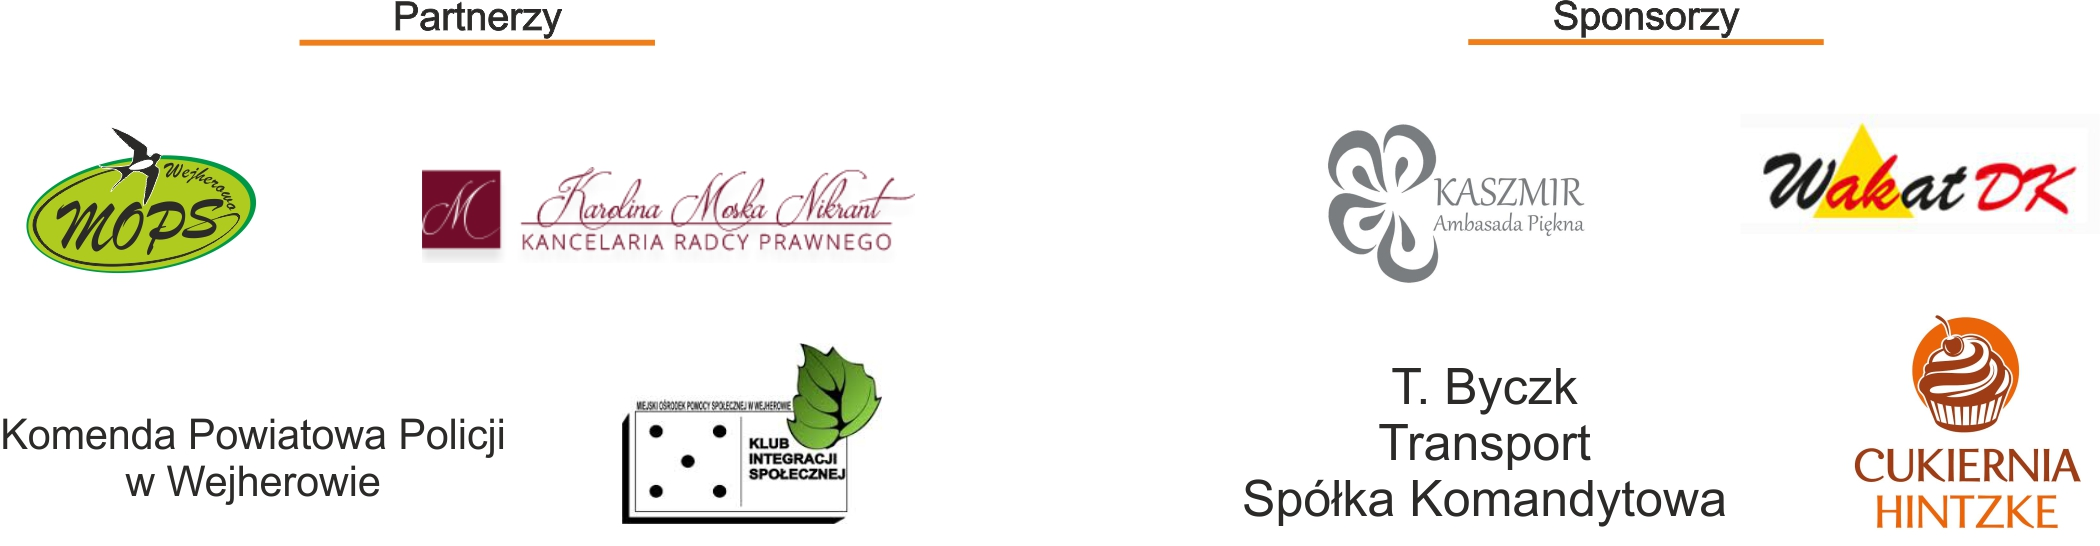 baner-sponsorzy-strona